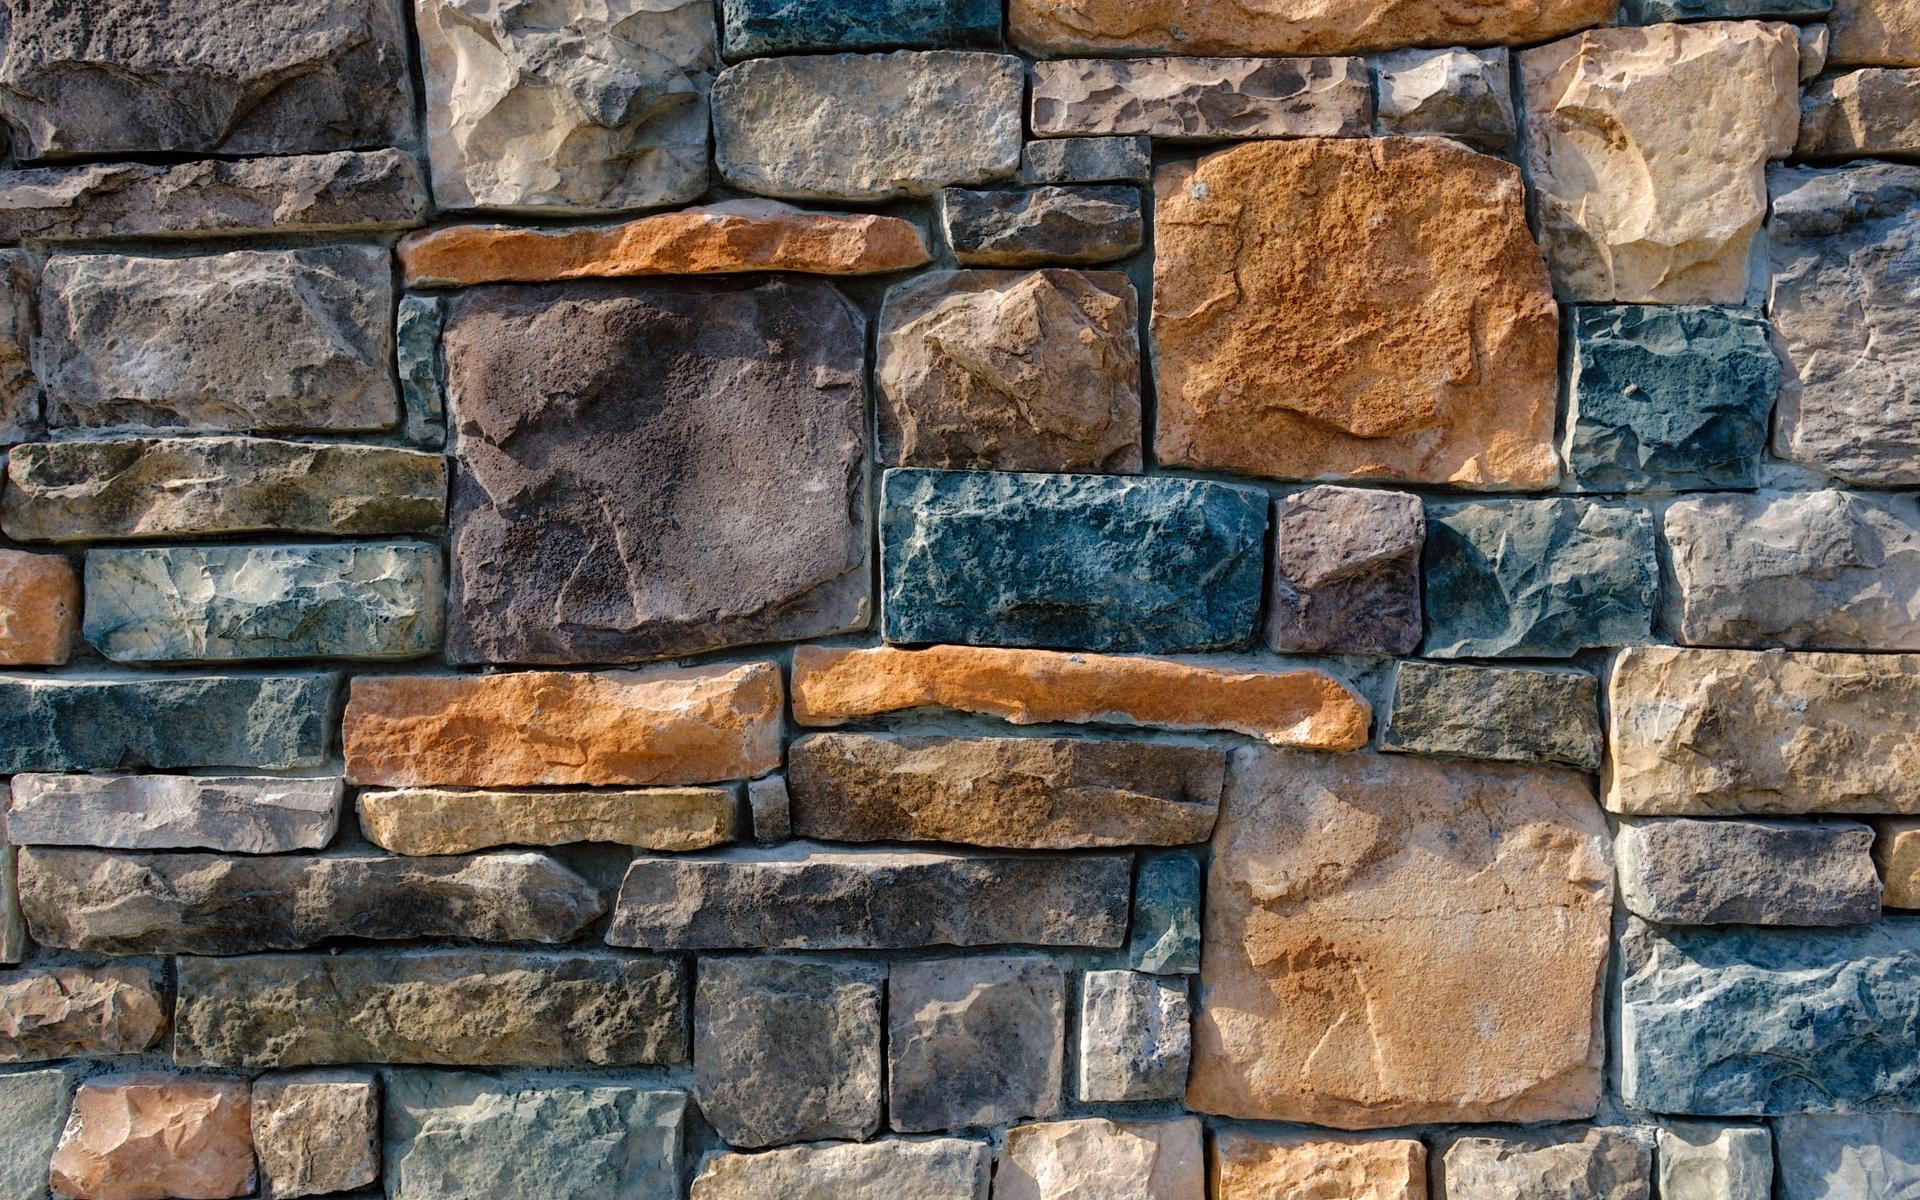 Brick wall pattern wallpaper 1920x1200 67484 WallpaperUP 1920x1200